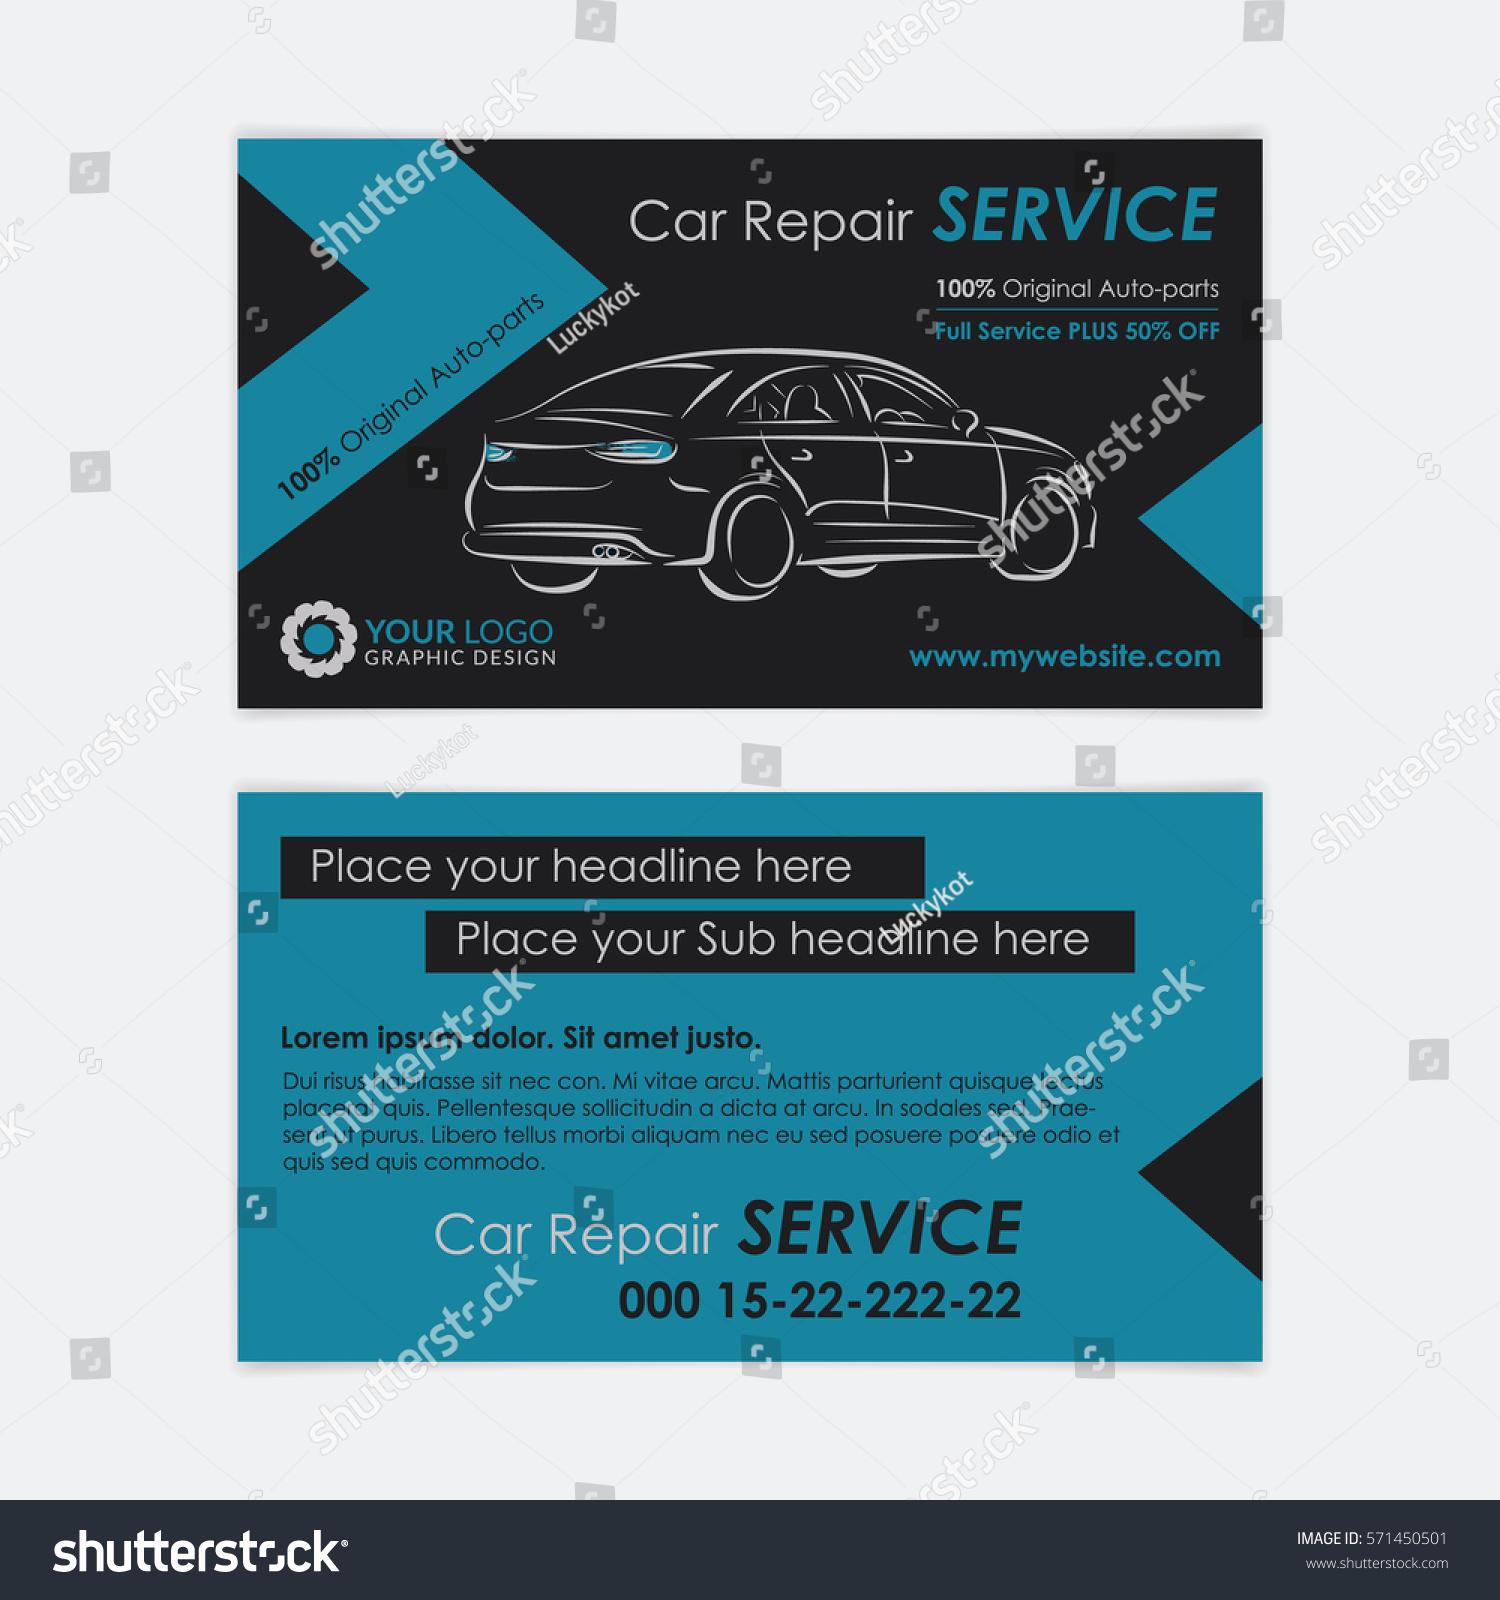 Auto repair business card template create stock vector hd royalty auto repair business card template create your own business cards mockup vector illustration flashek Choice Image